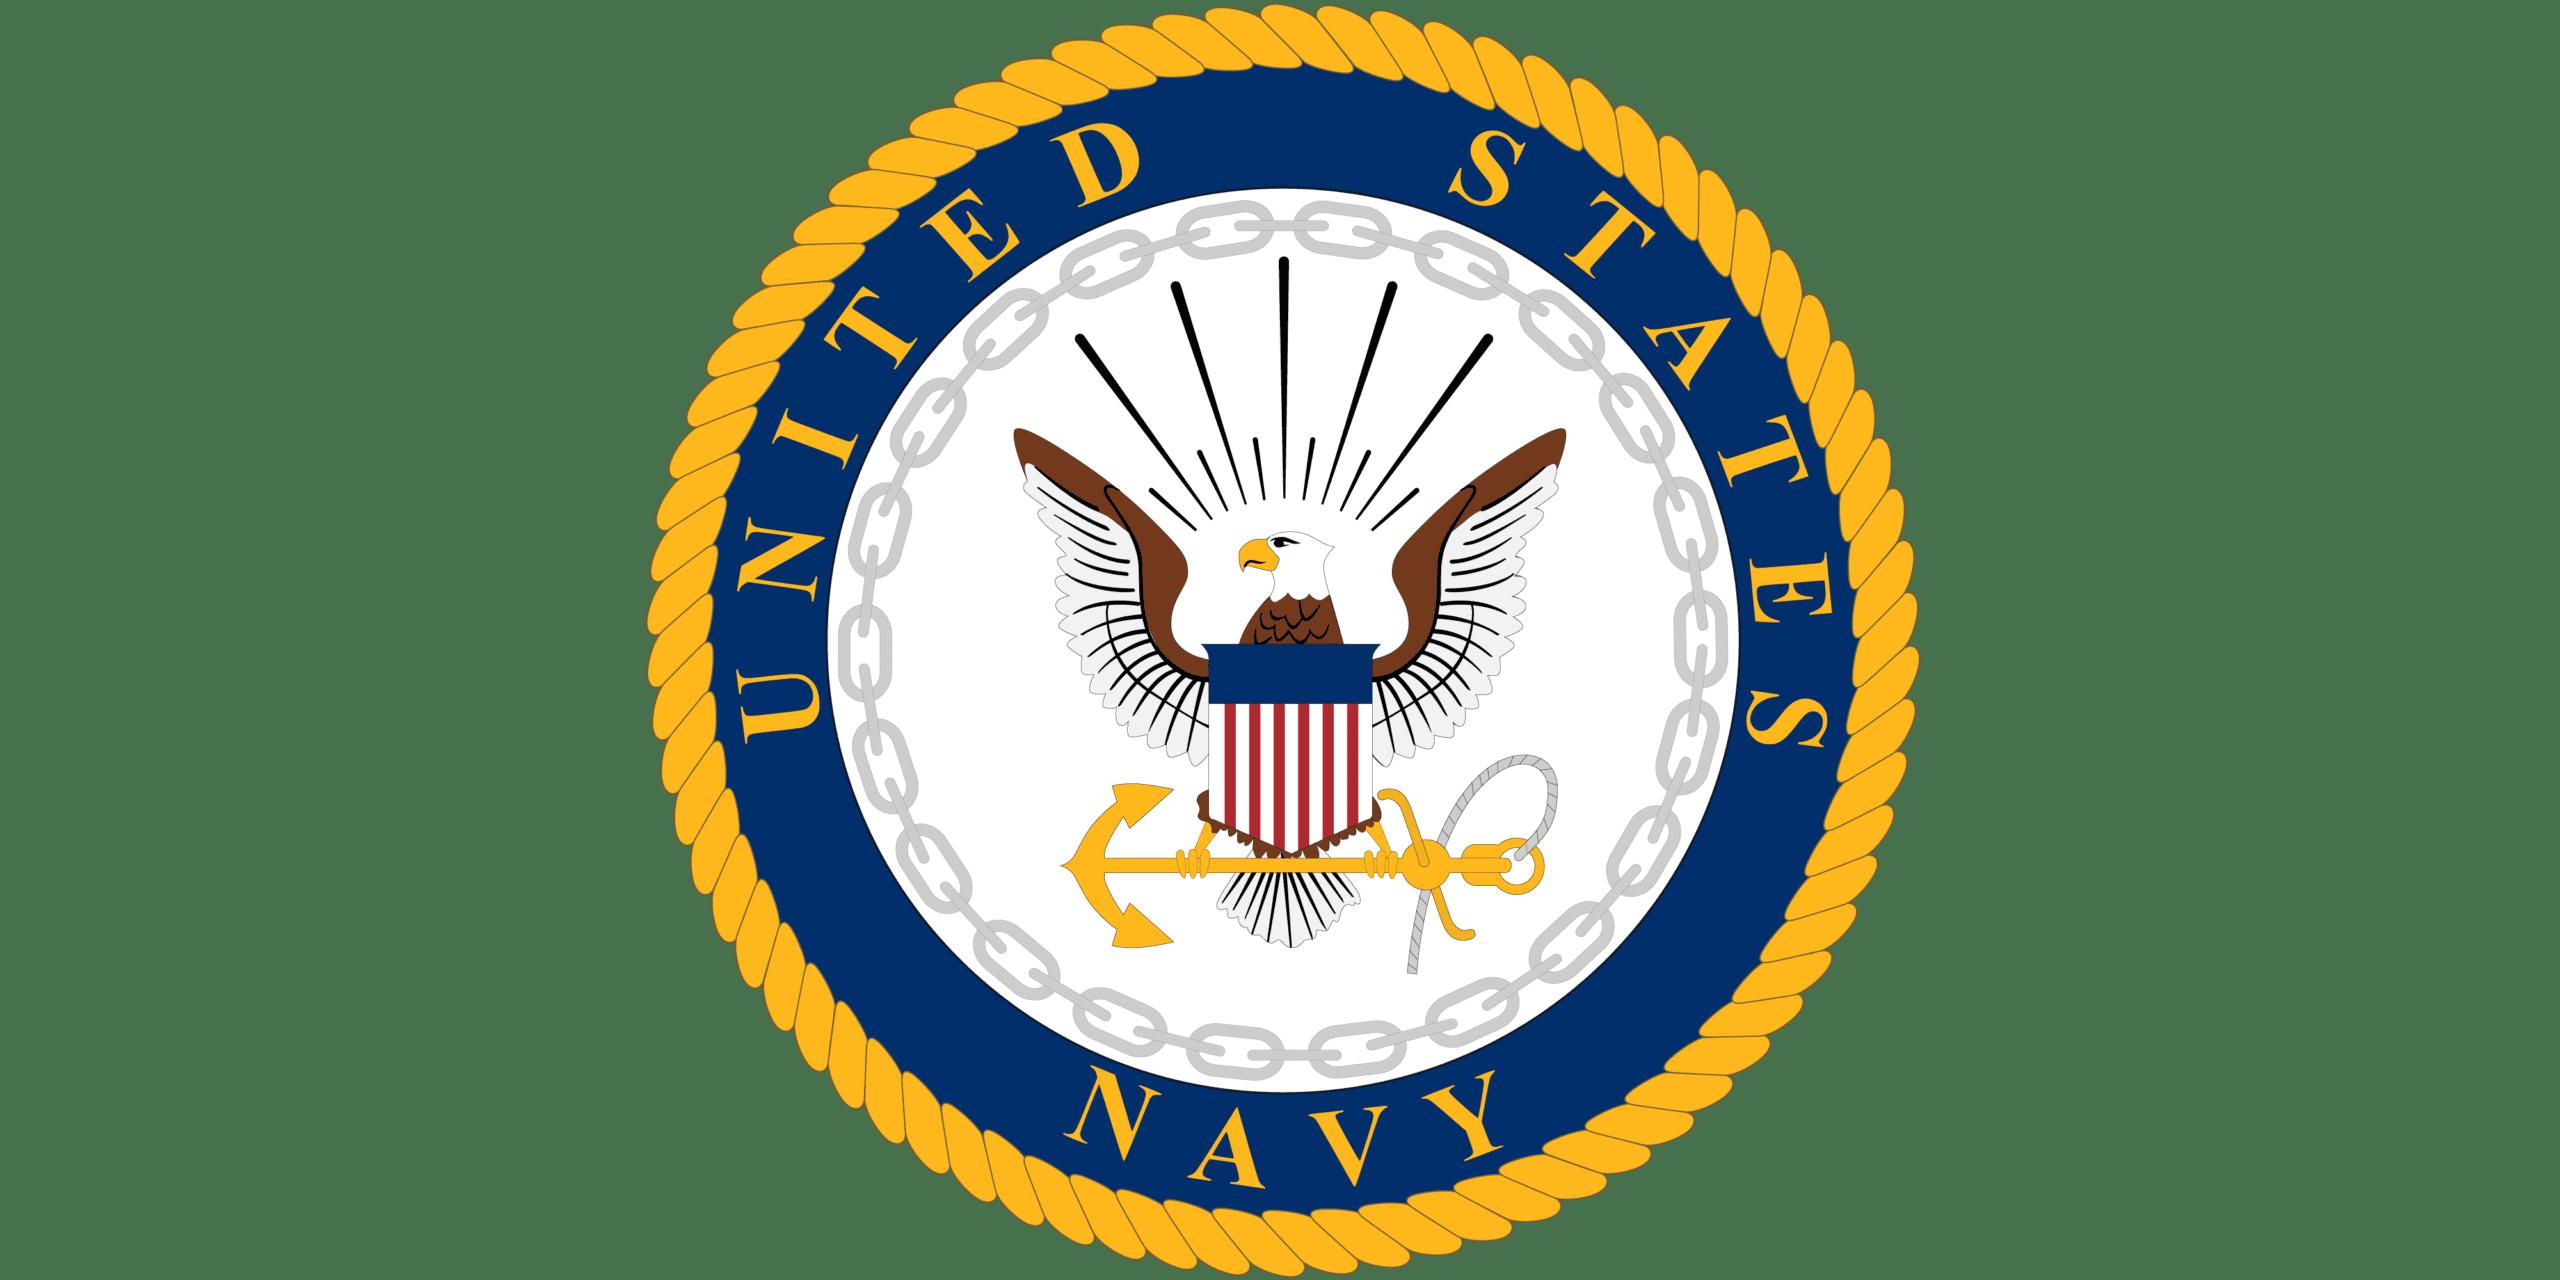 Logotipo de United States Navy